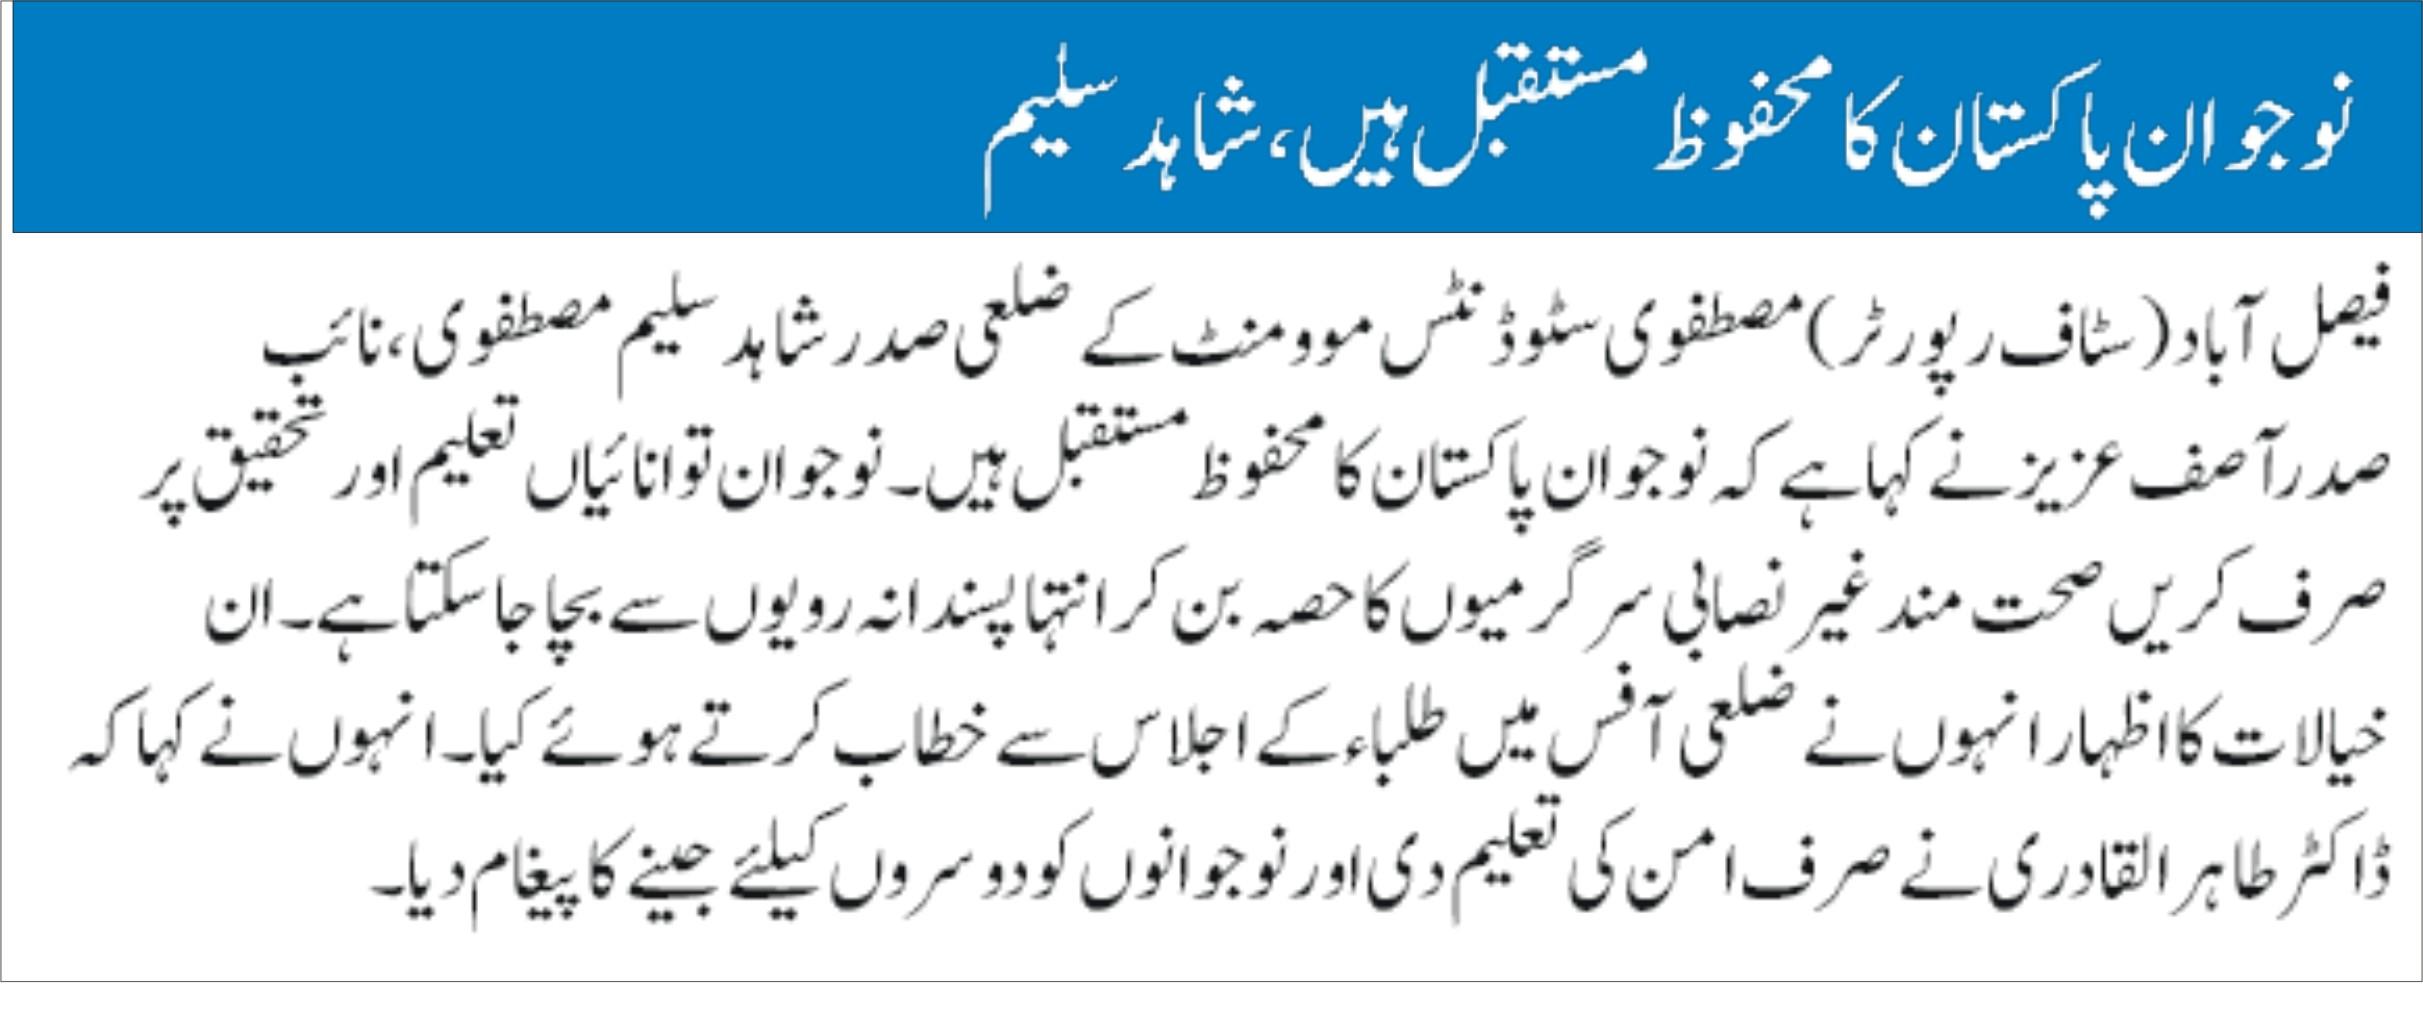 Pakistan Awami Tehreek  Print Media Coverage Daily Jang page 2-